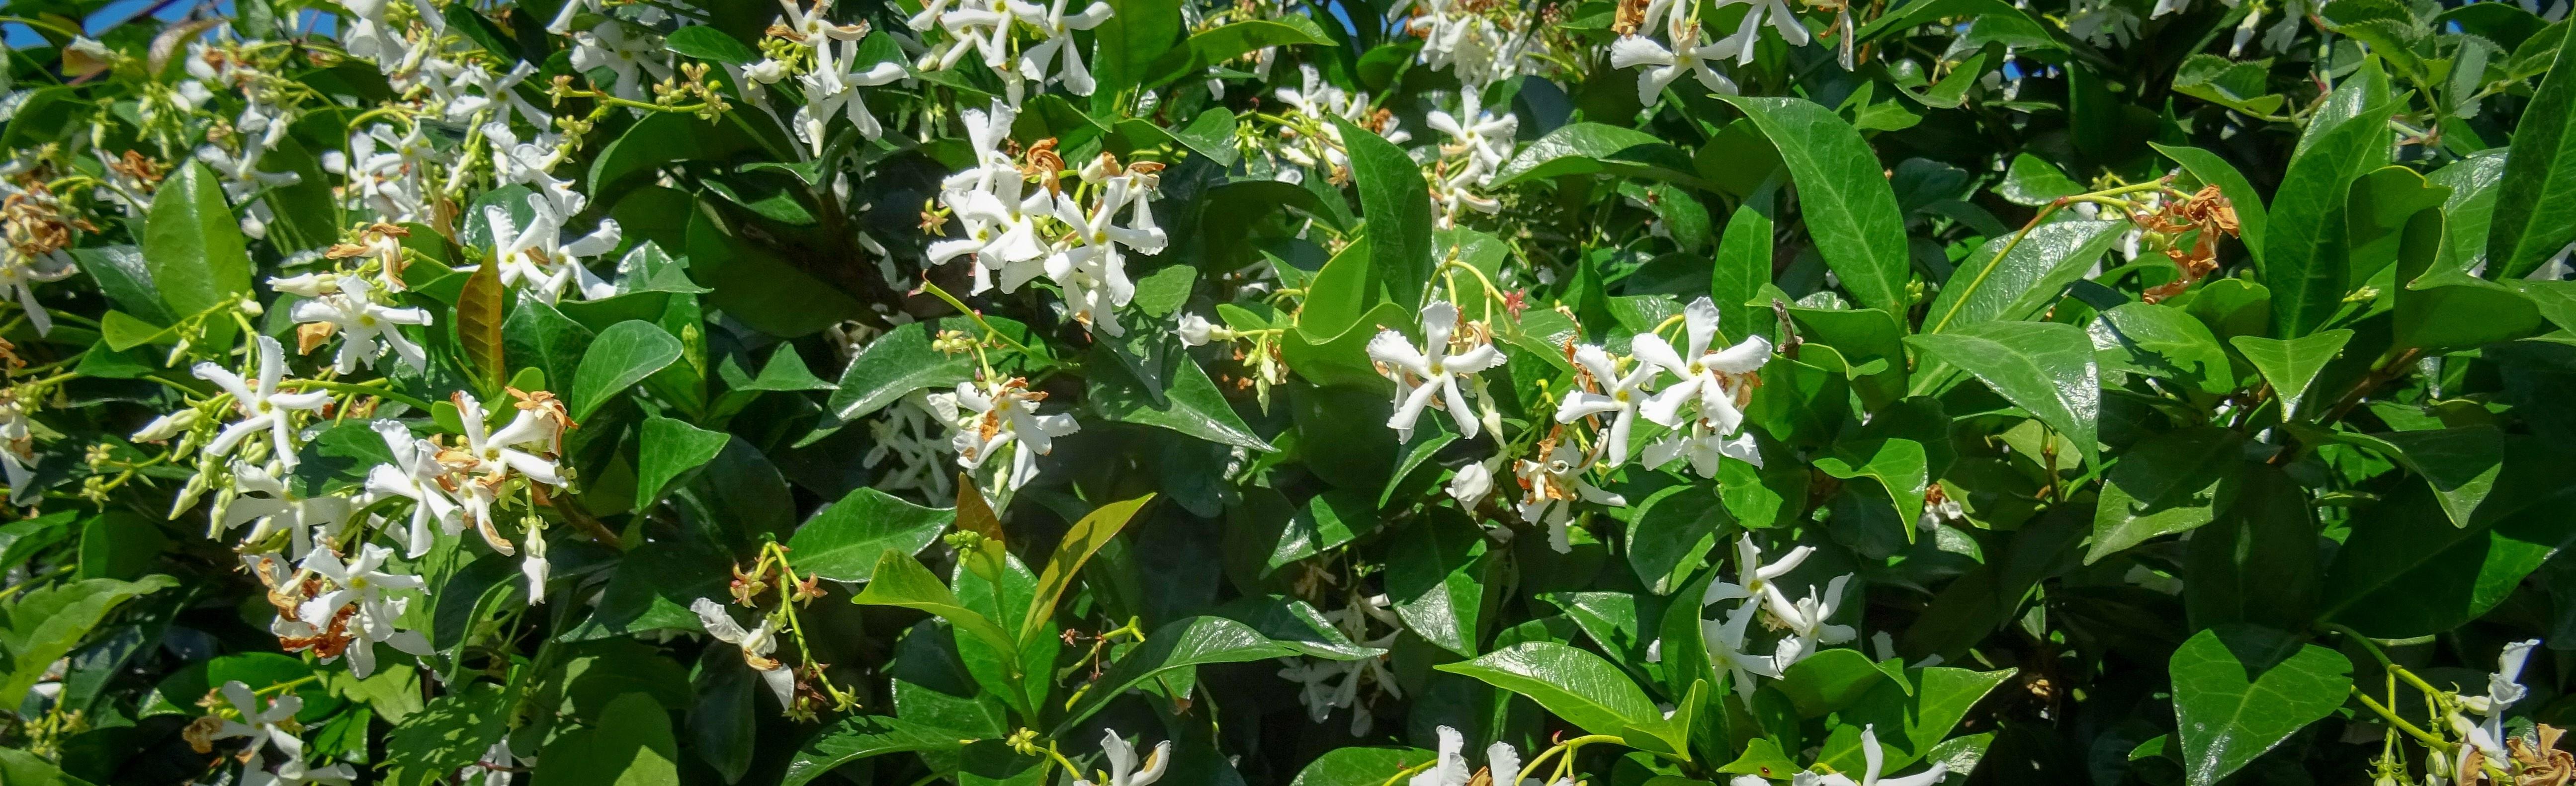 Gelsomino Rampicante per siepi fiorite